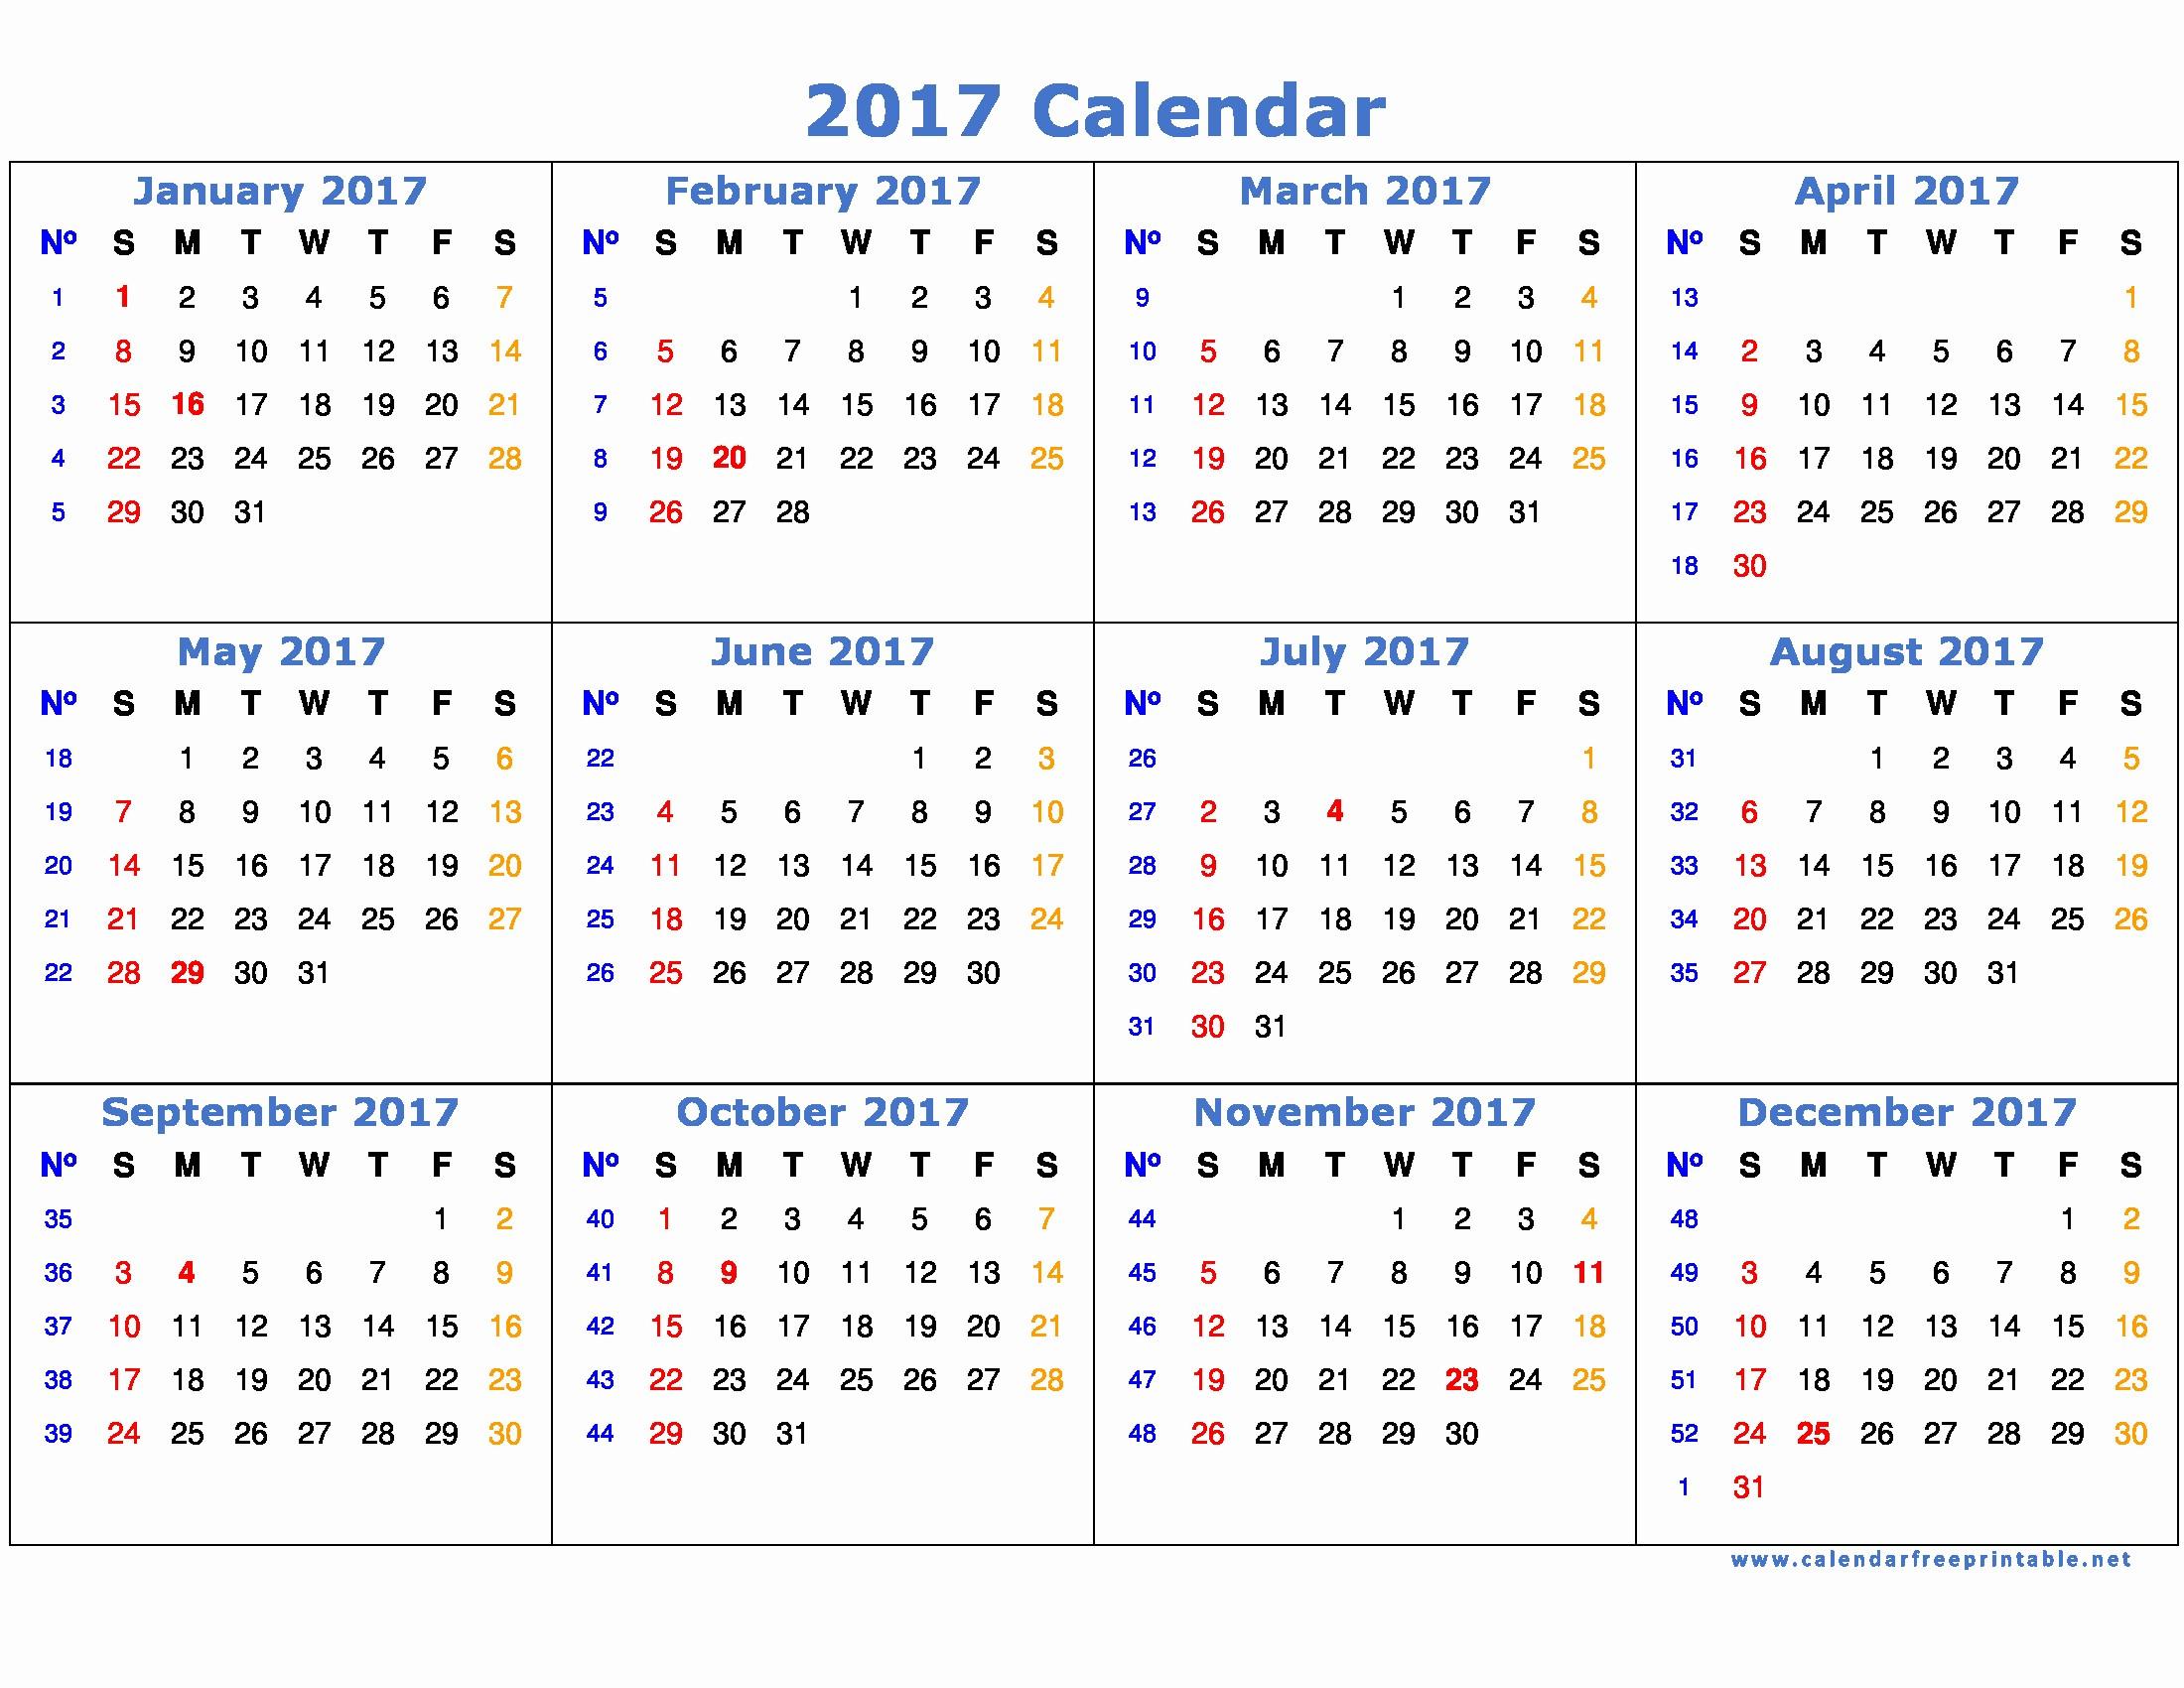 2017 Calendar Template with Notes Fresh 2017 Calendar Template